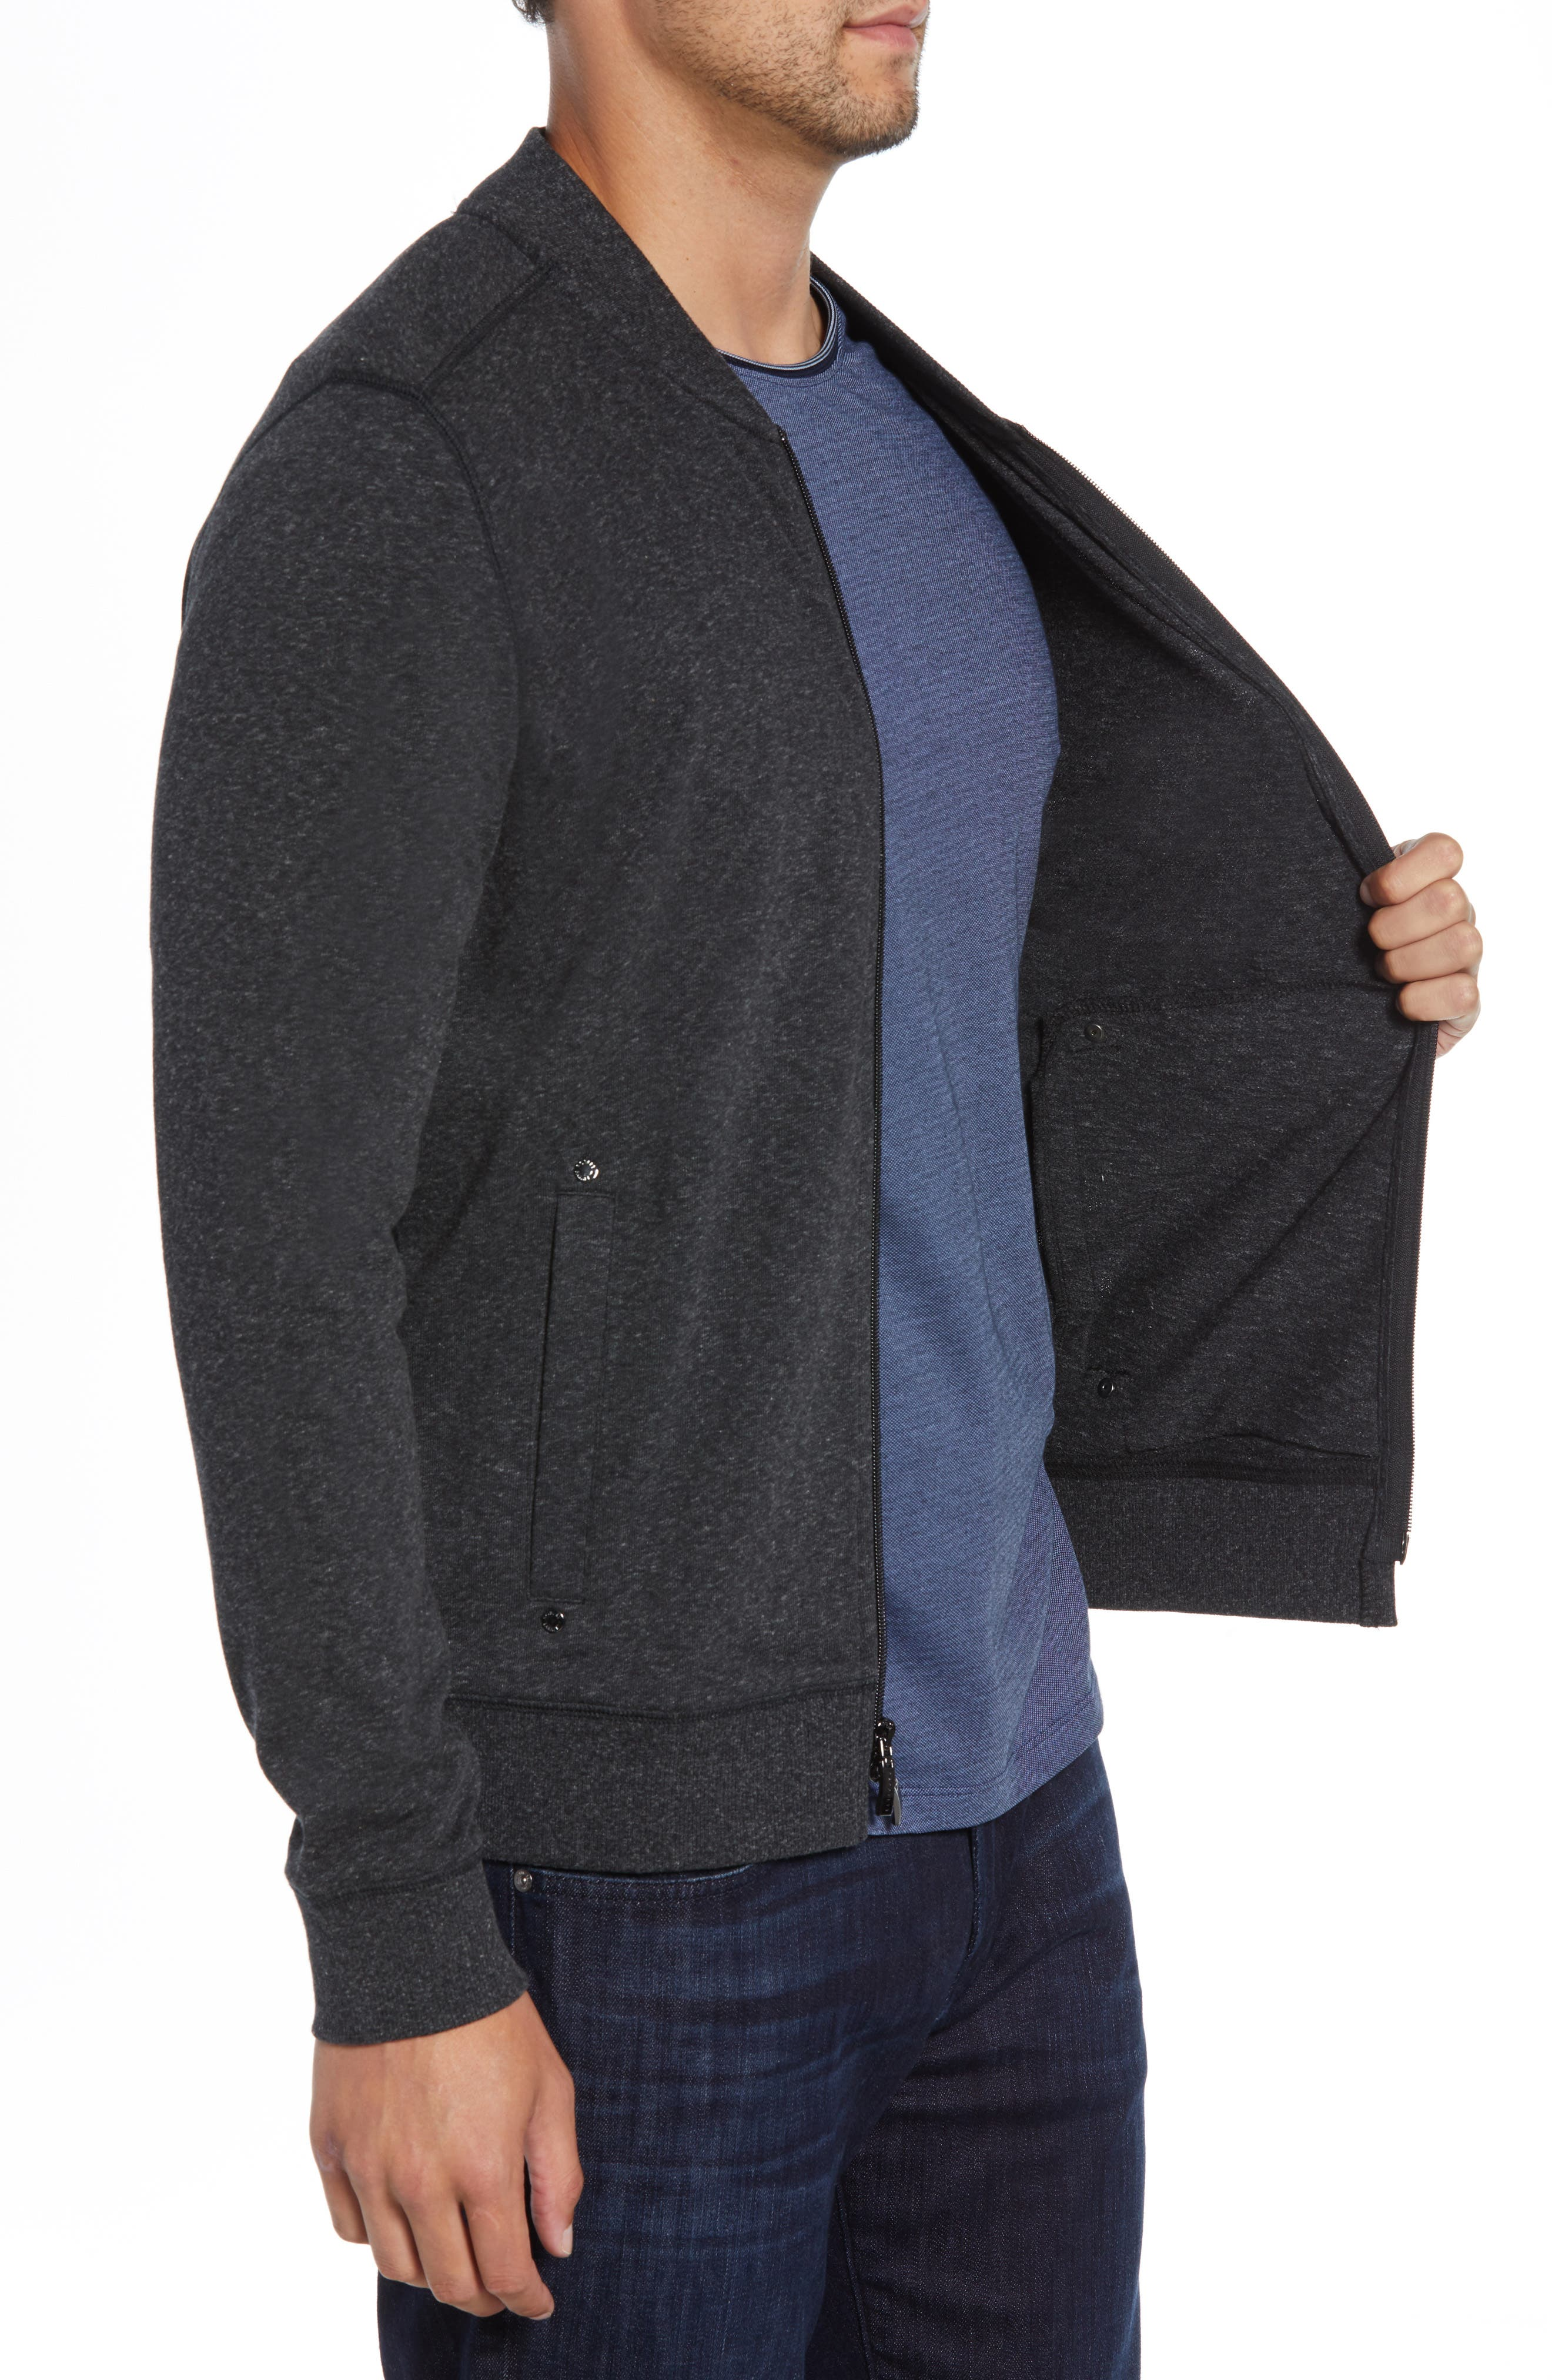 ROBERT BARAKETT, Front Zip Knit Jacket, Alternate thumbnail 3, color, BLACK